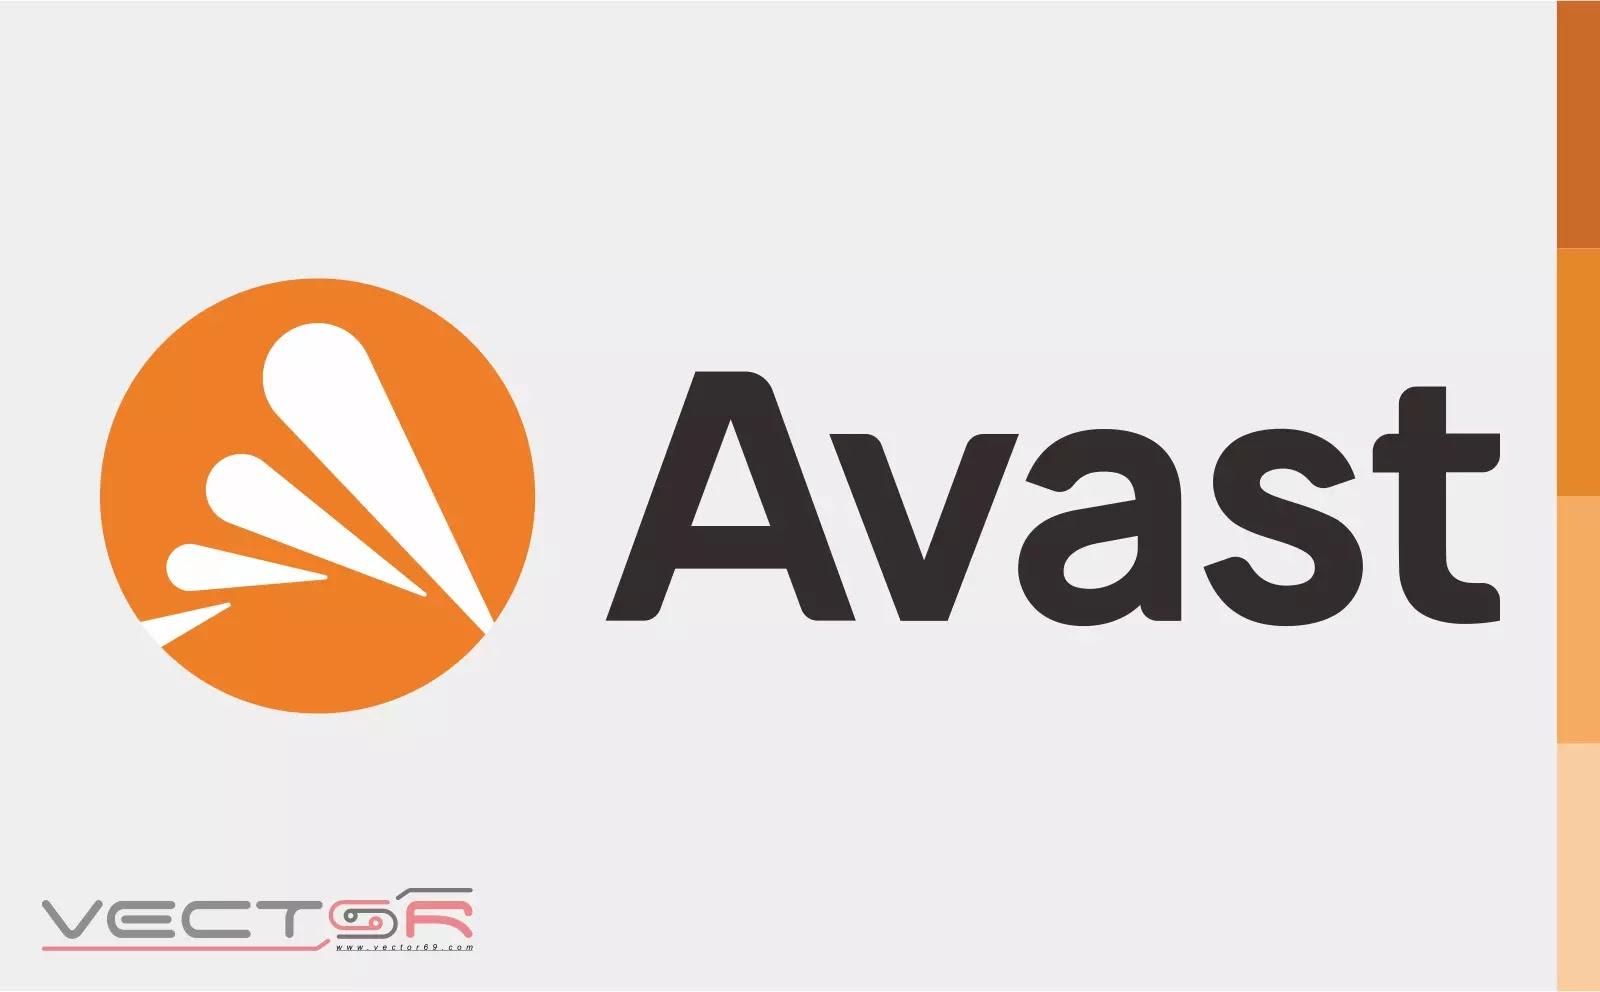 Avast Antivirus (2021) Logo - Download Vector File AI (Adobe Illustrator)